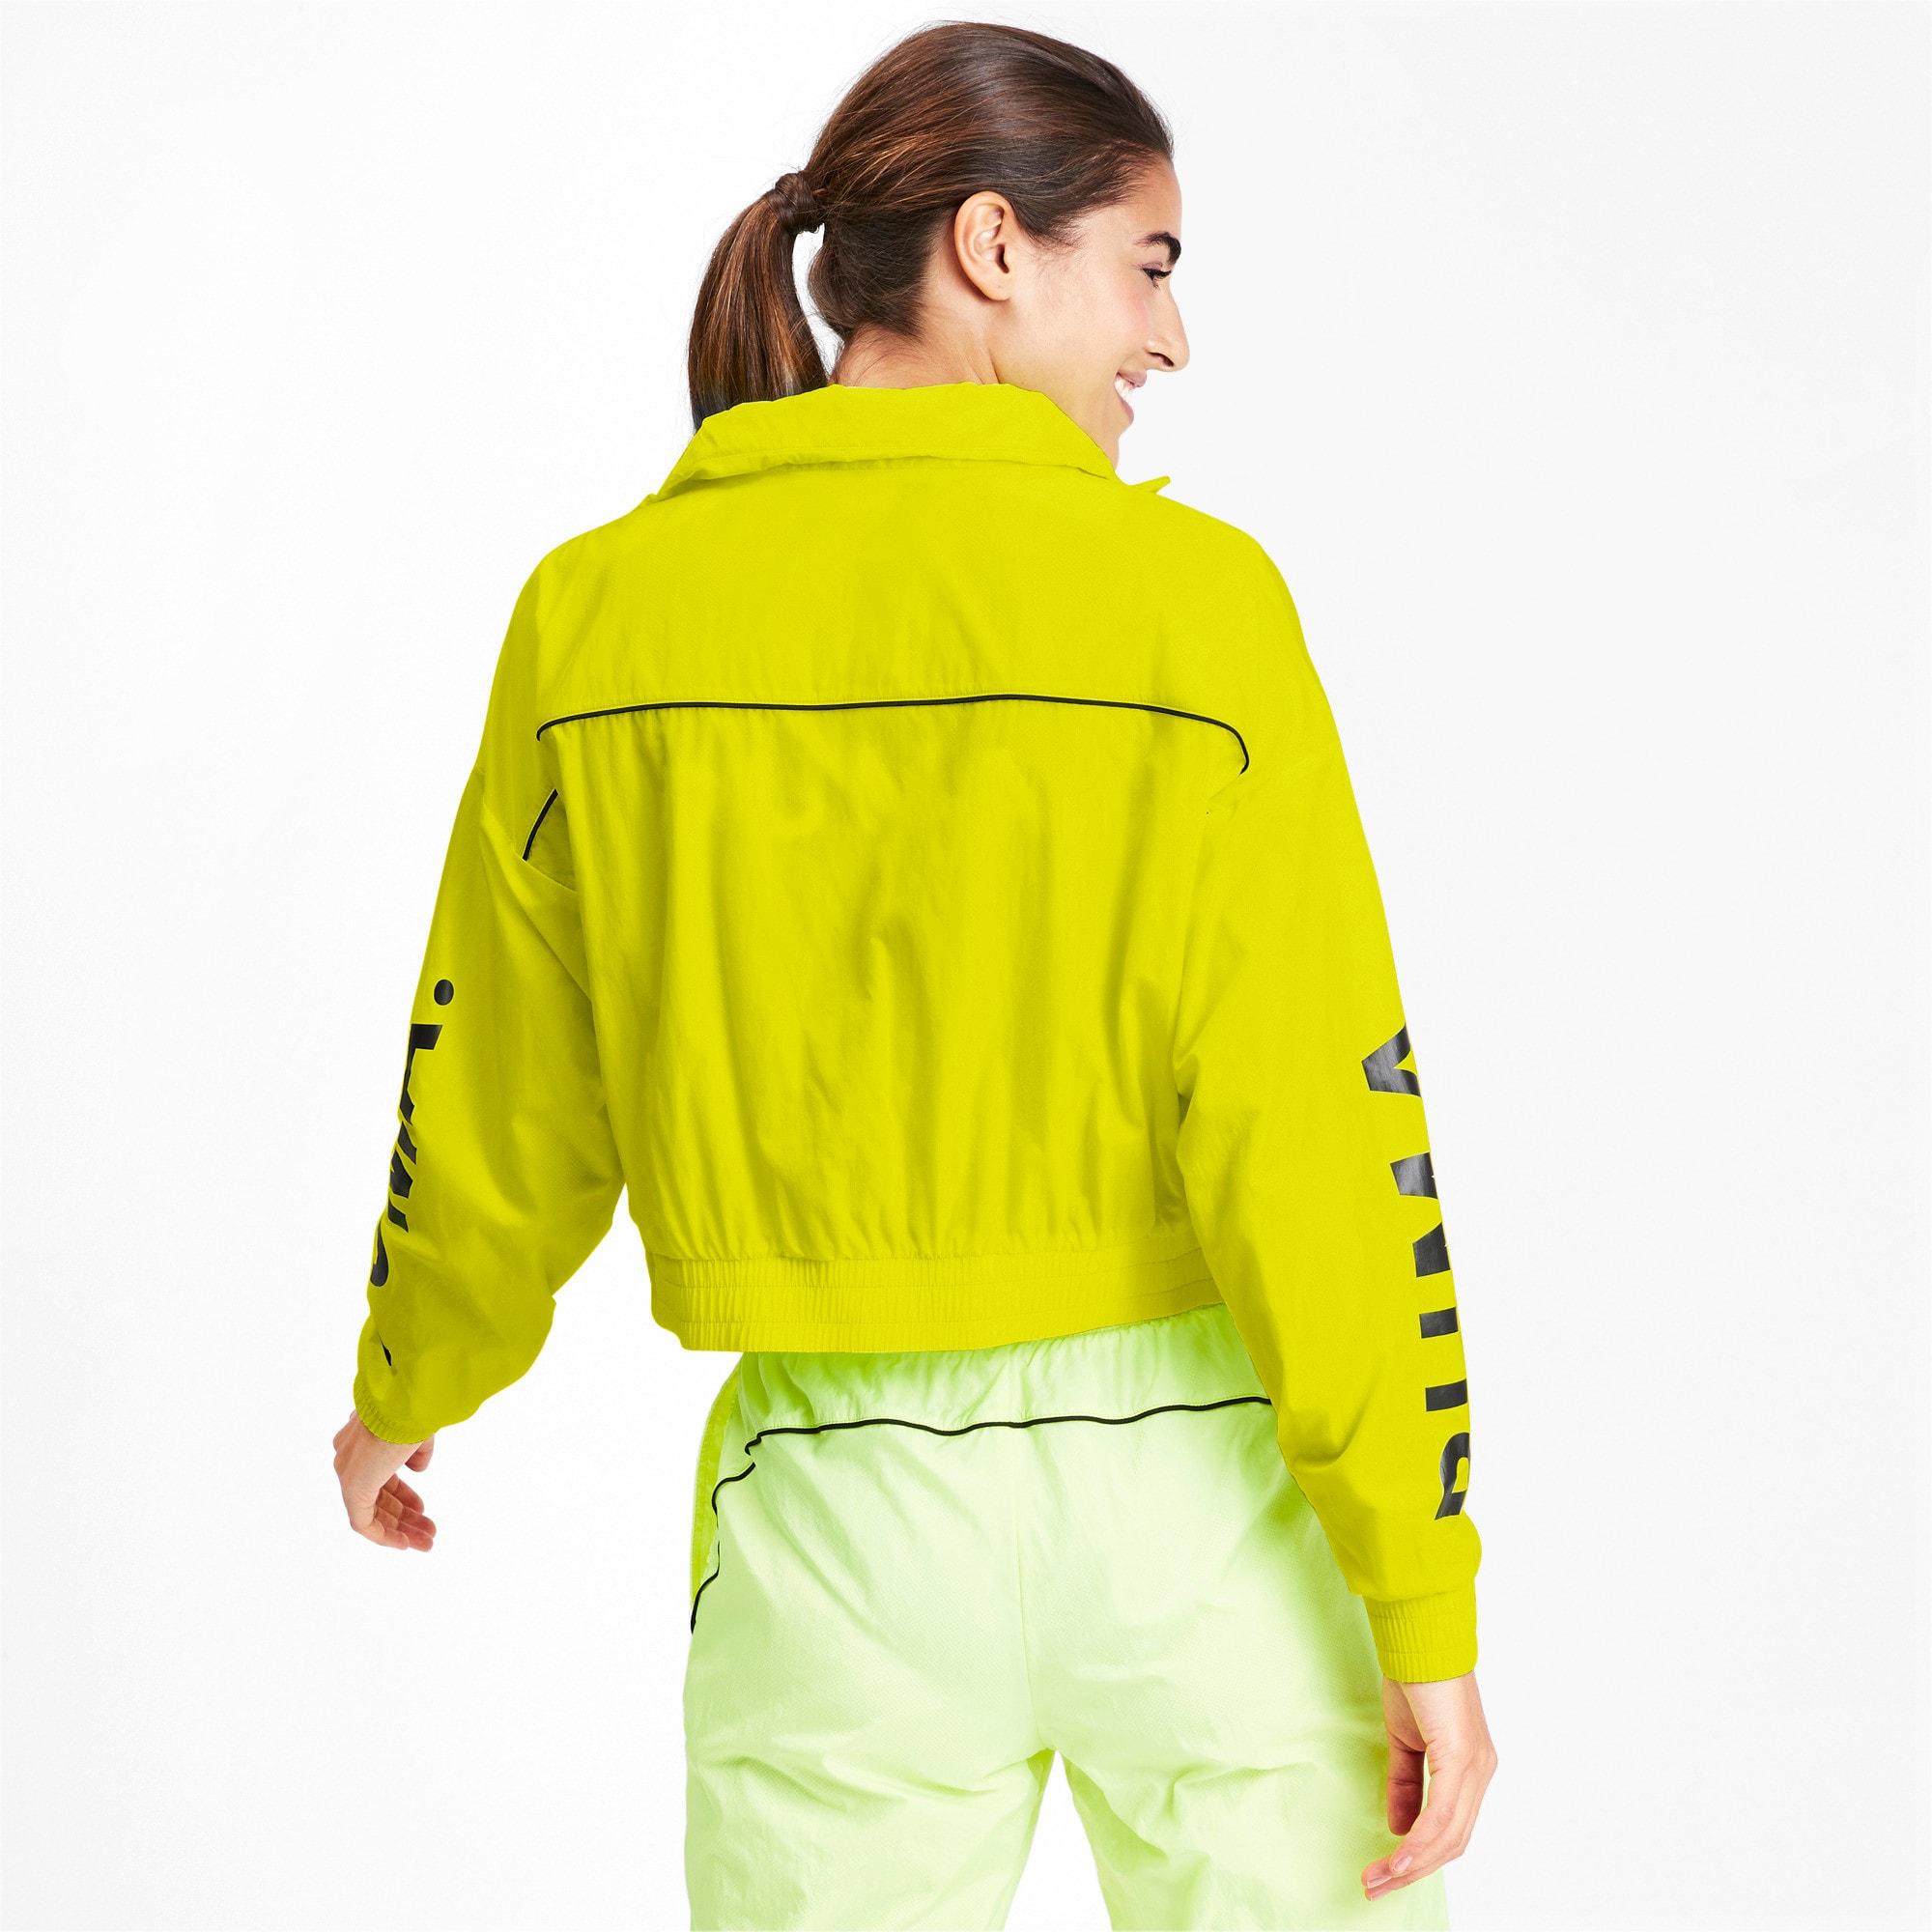 Thumbnail 2 of Chase Woven Women's Jacket, Yellow Alert, medium